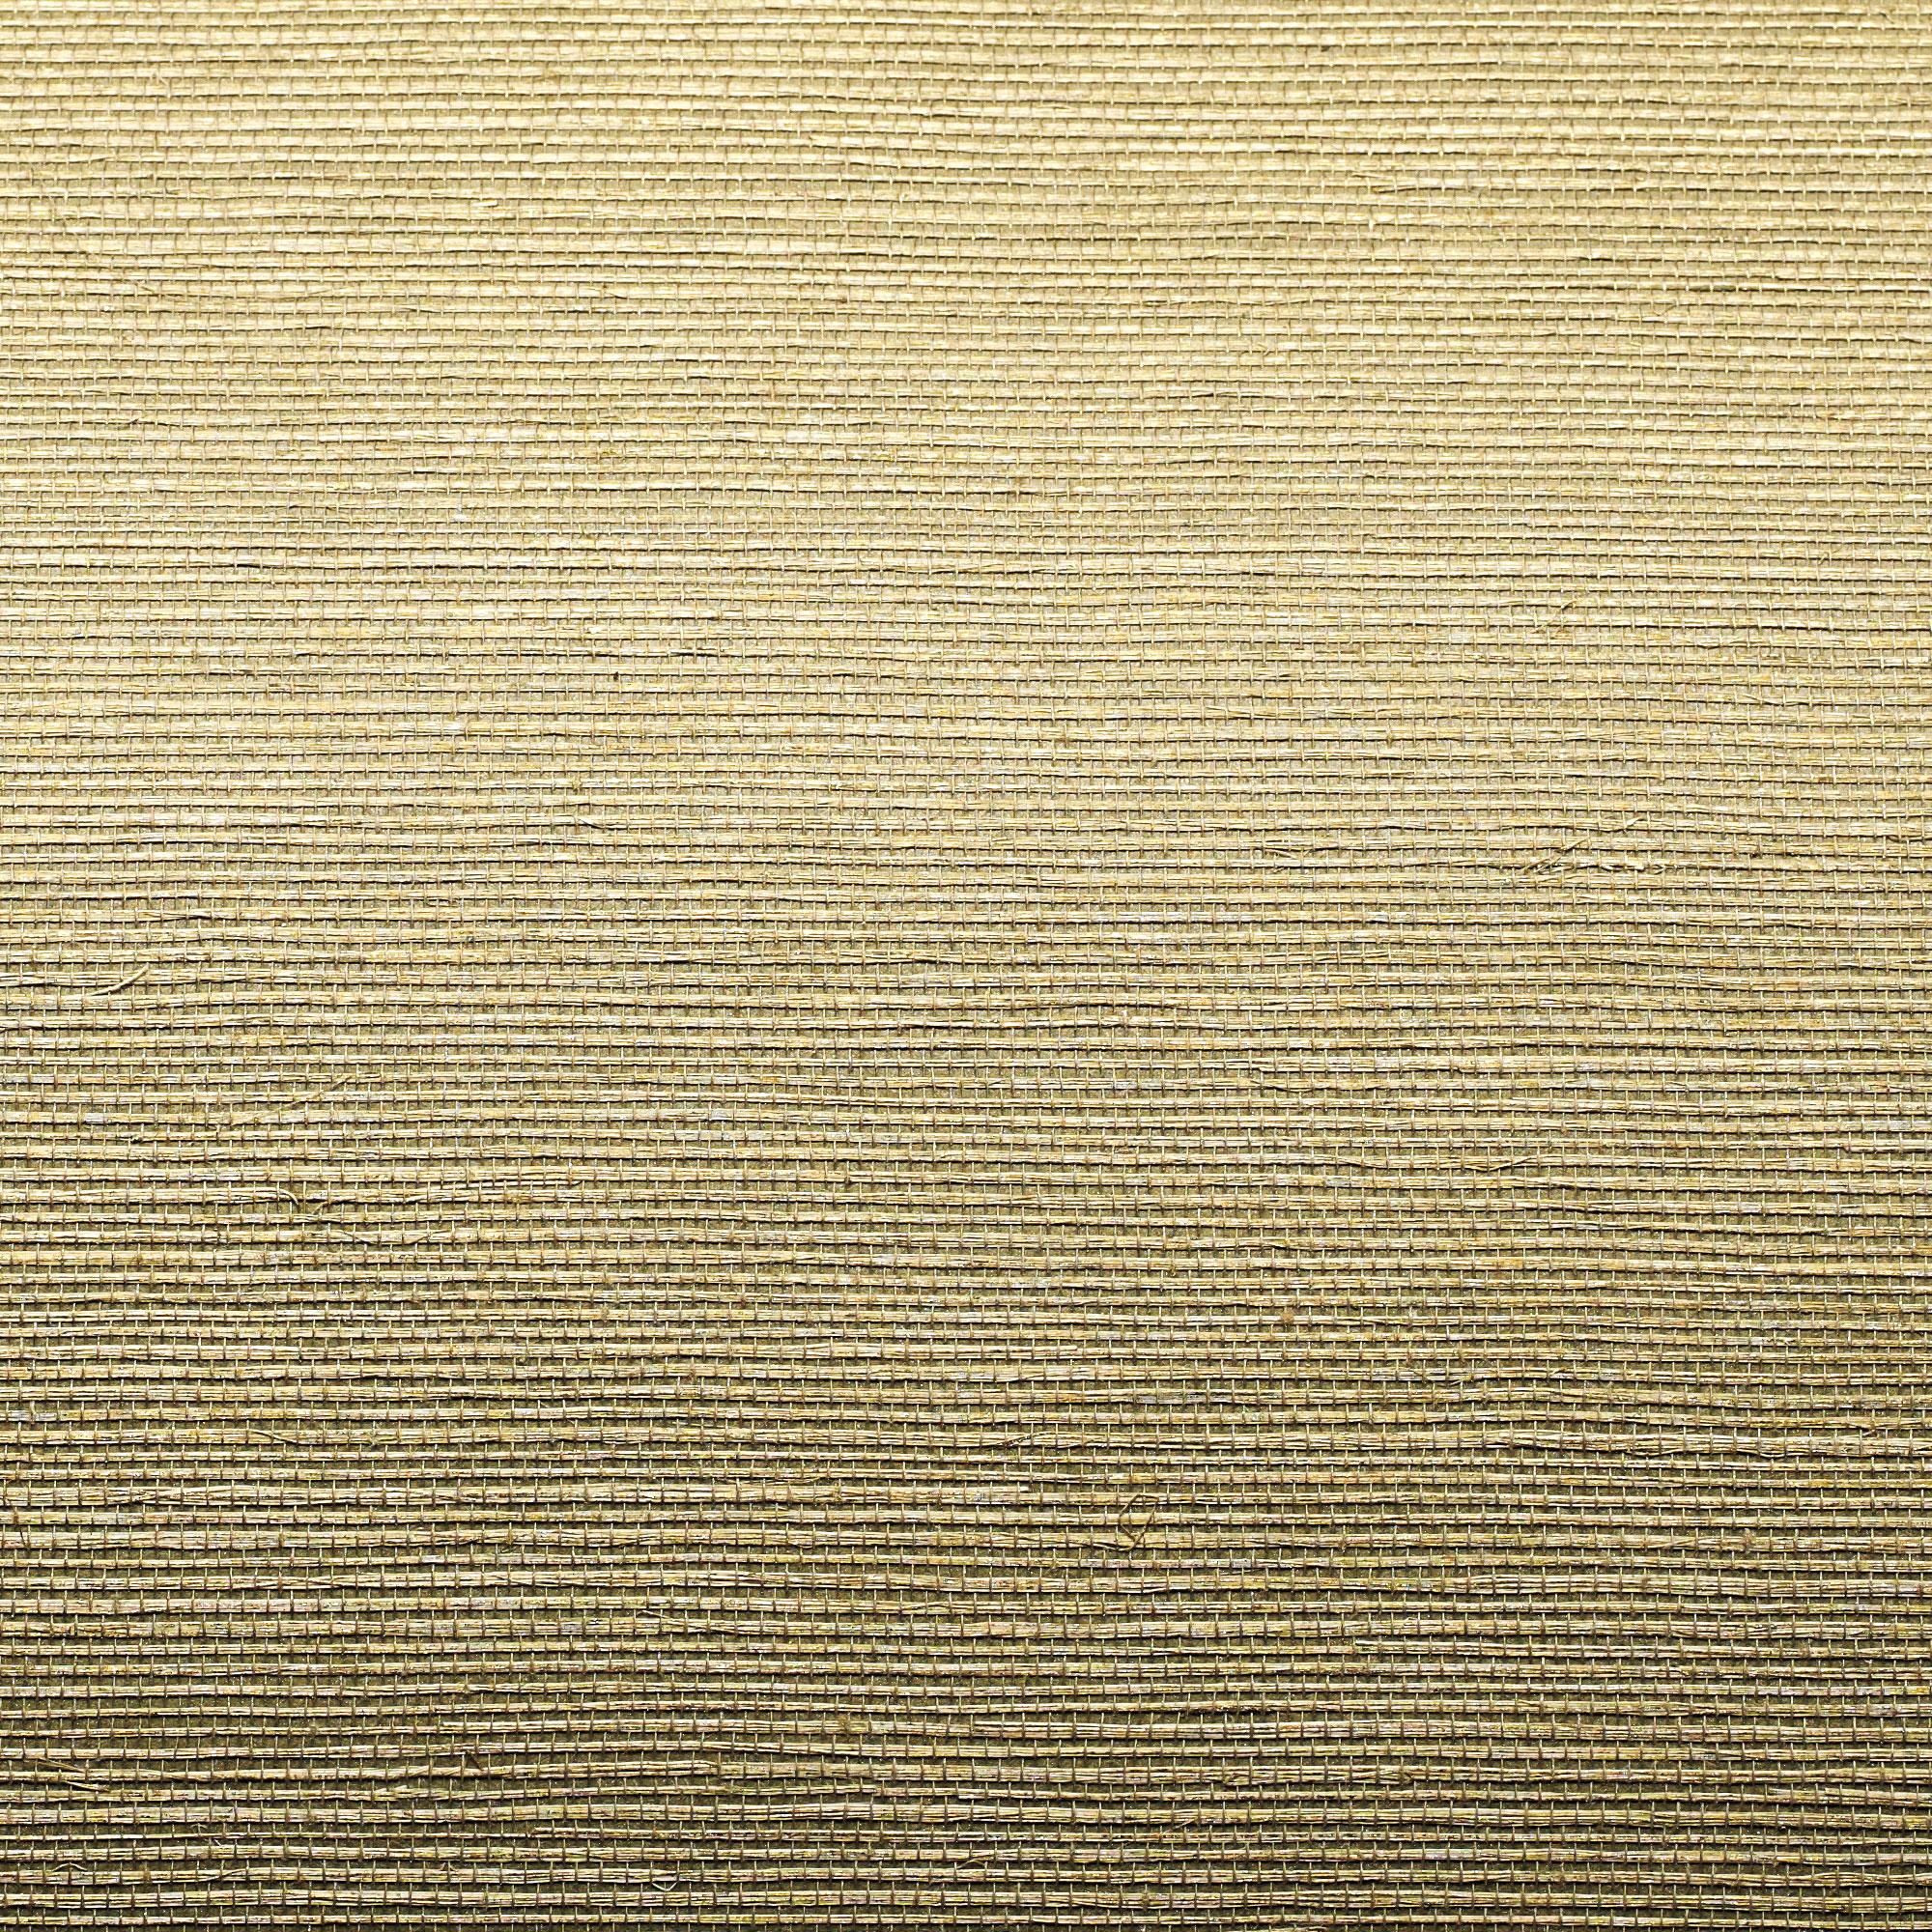 swatch-WL315-cascadia-pinehurst-web.jpg